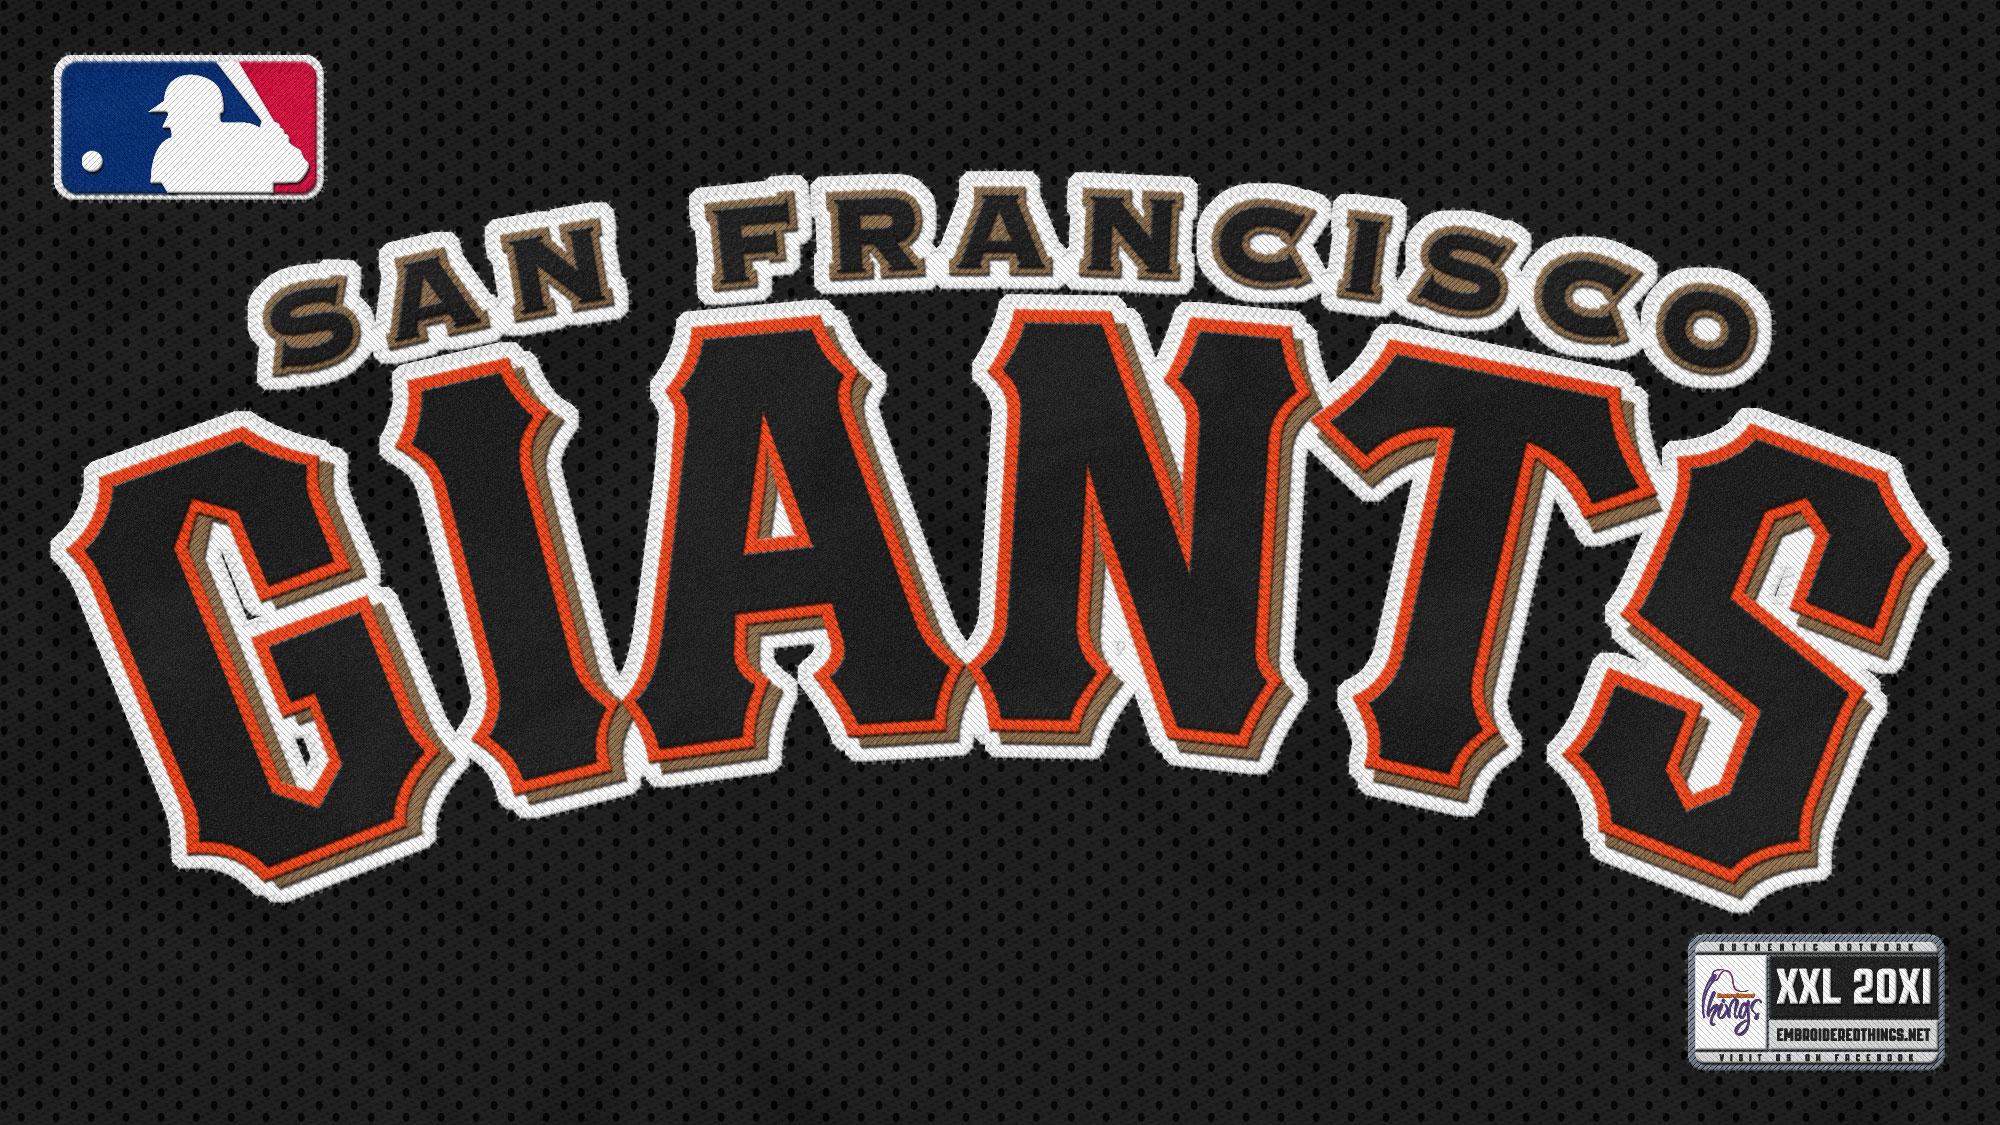 73 San Francisco Giants Wallpapers On Wallpapersafari